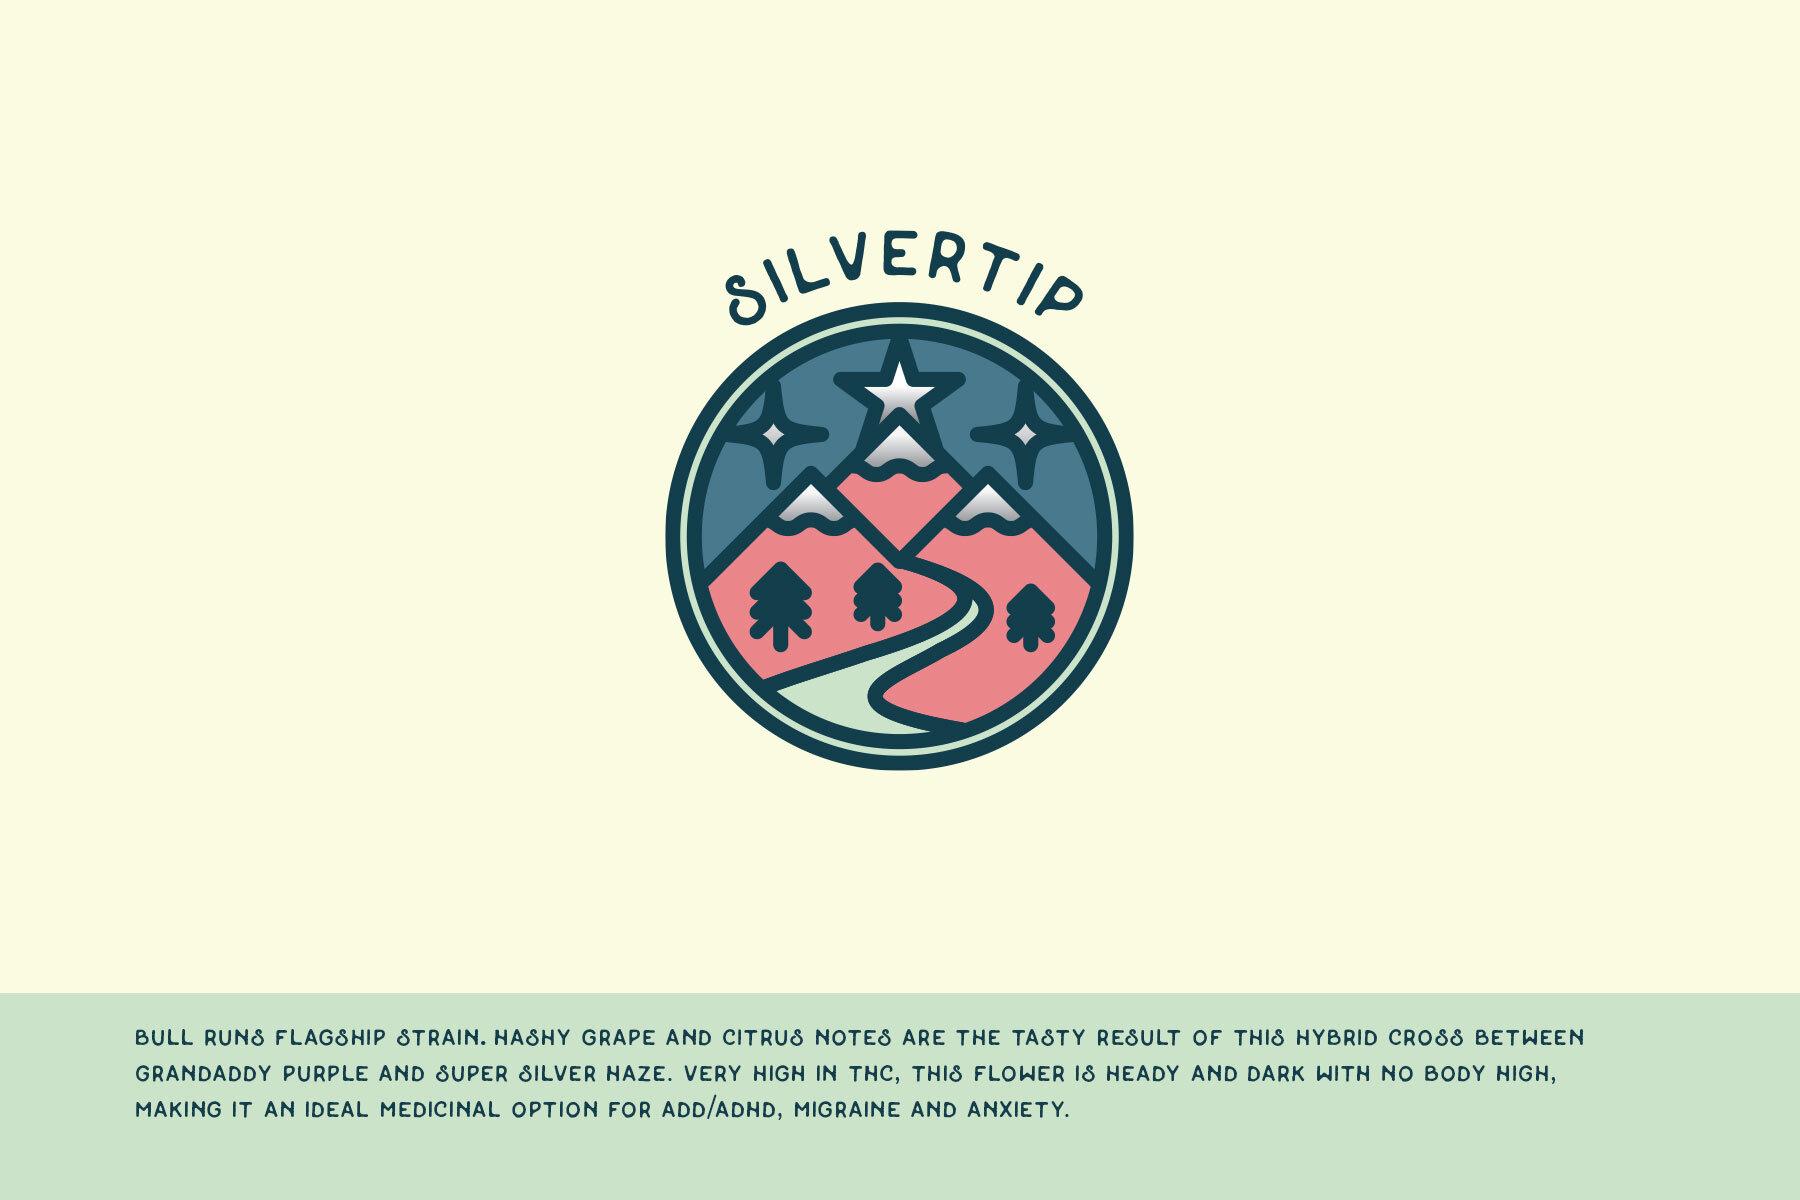 BRCC-icons-silvertip.jpg